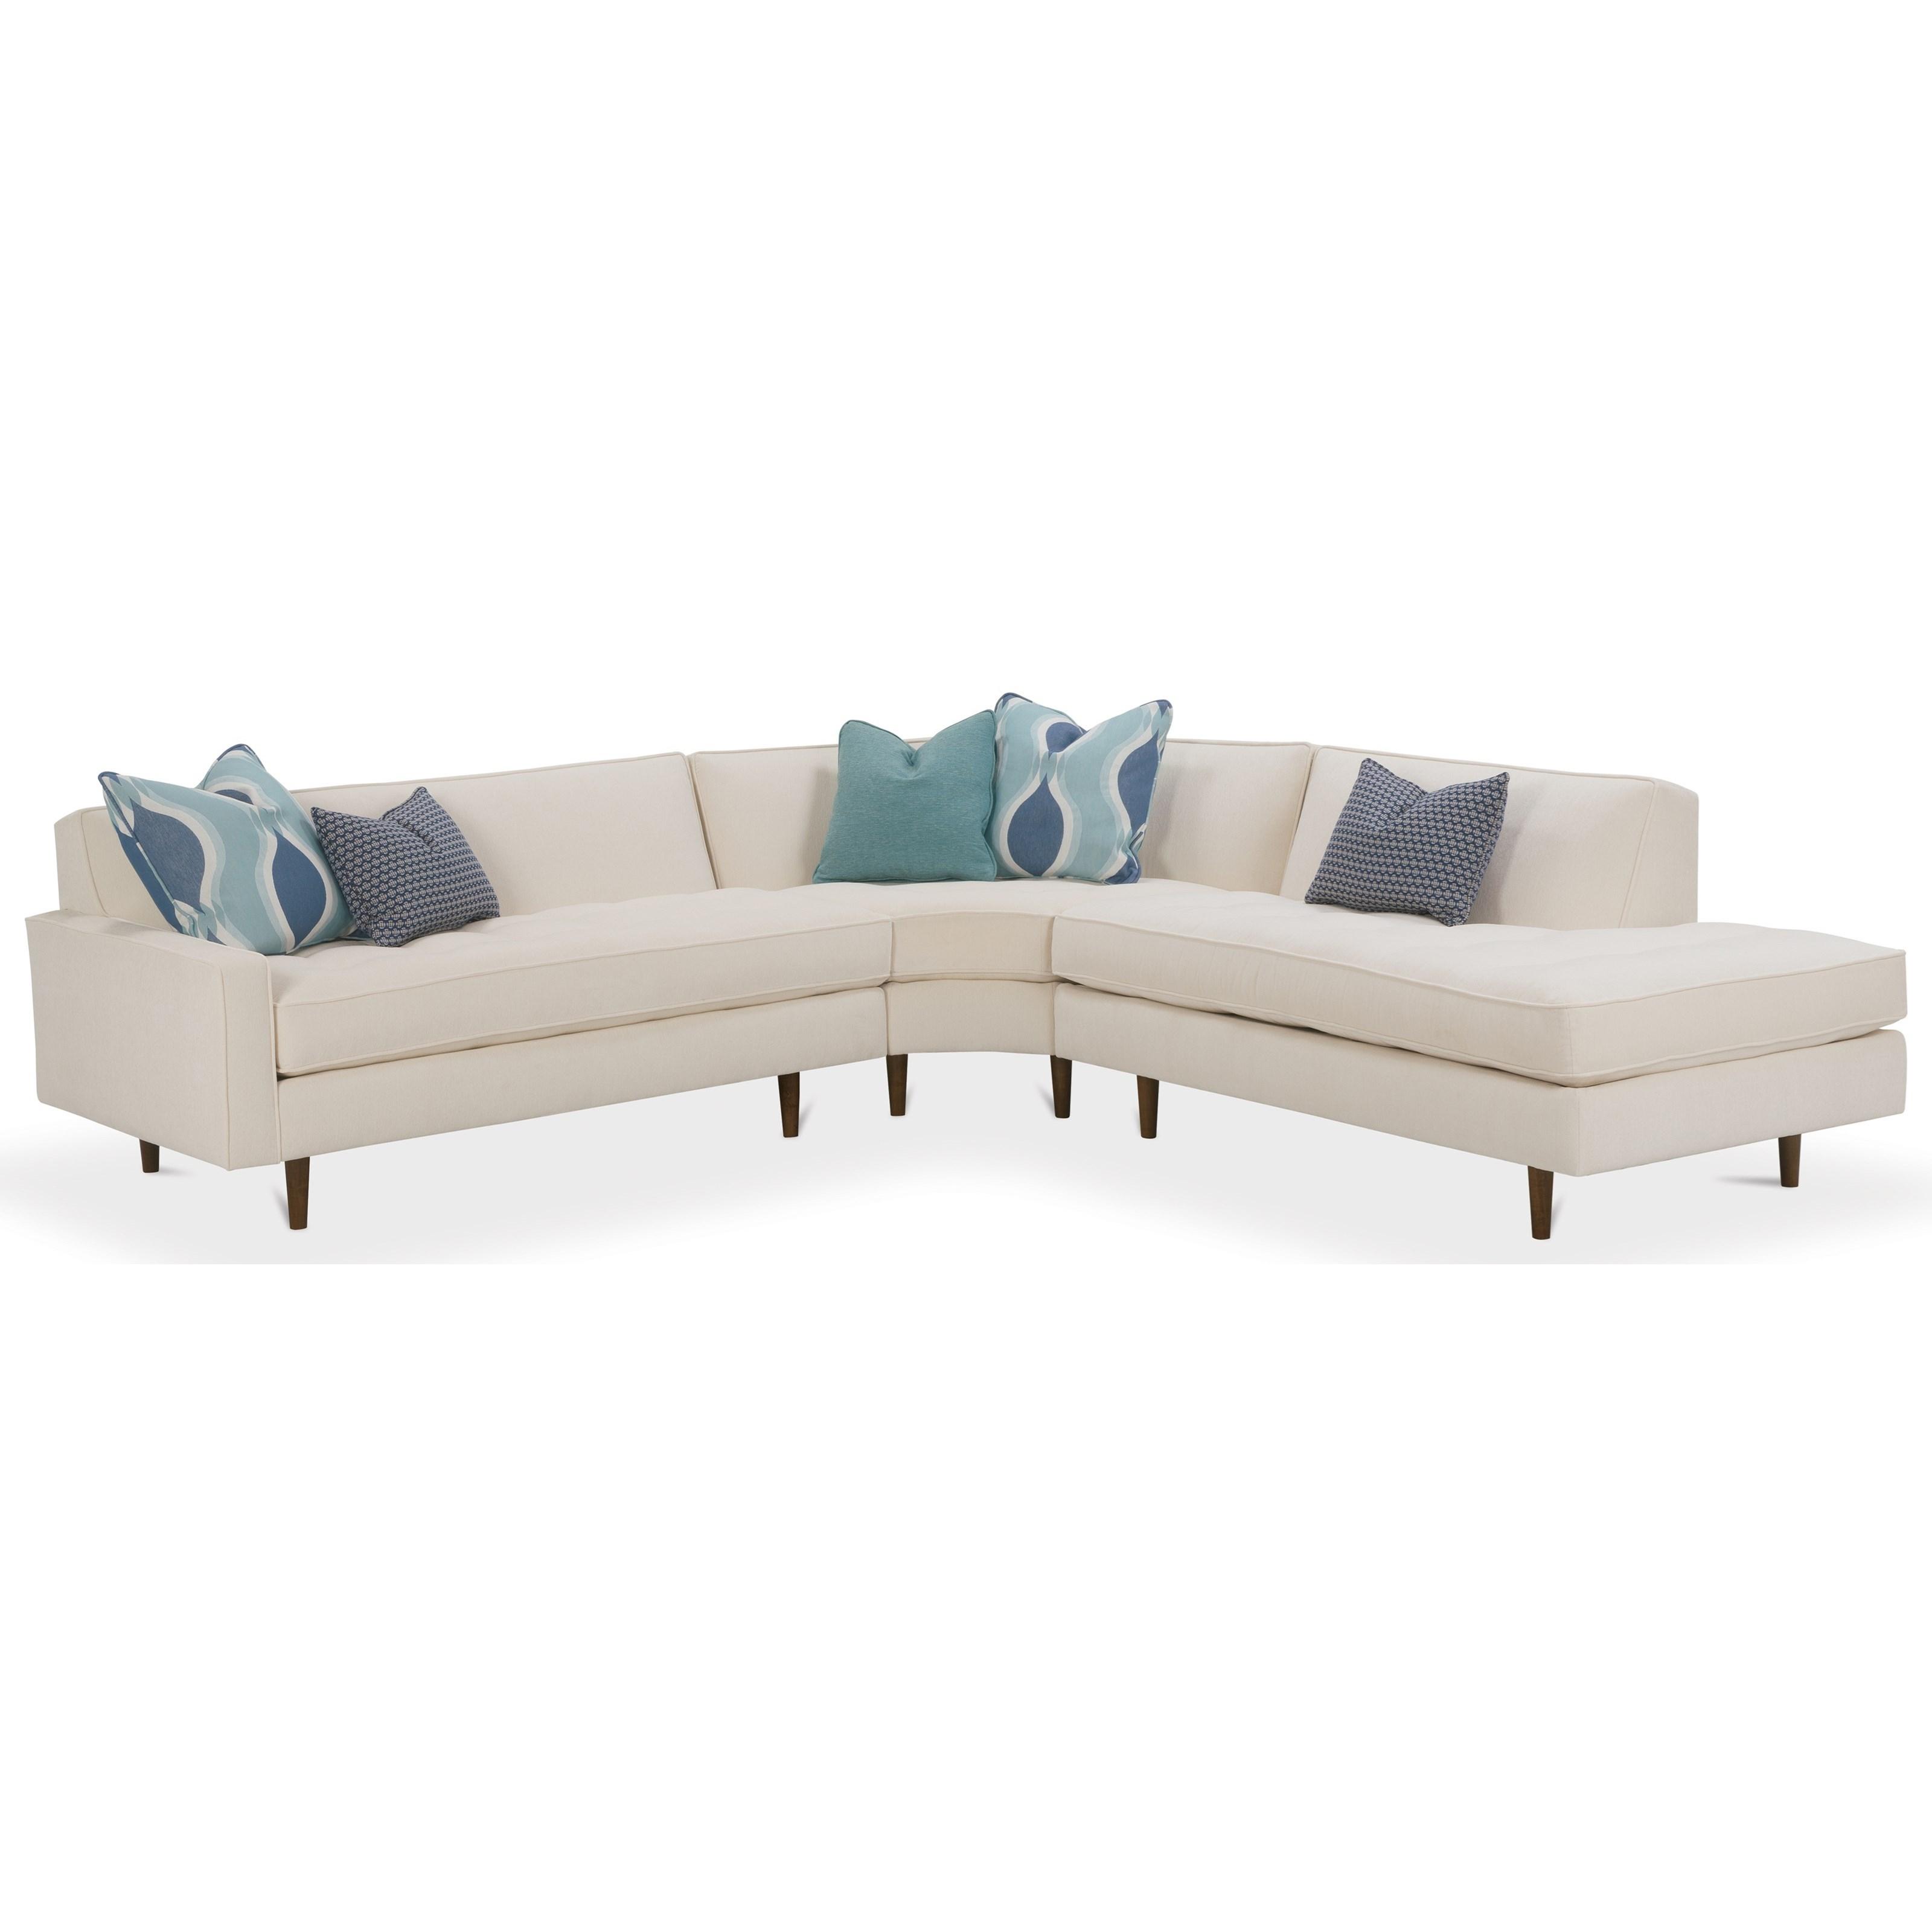 rowe masquerade sectional sofa elliot fabric microfiber 3 piece chaise barnett furniture